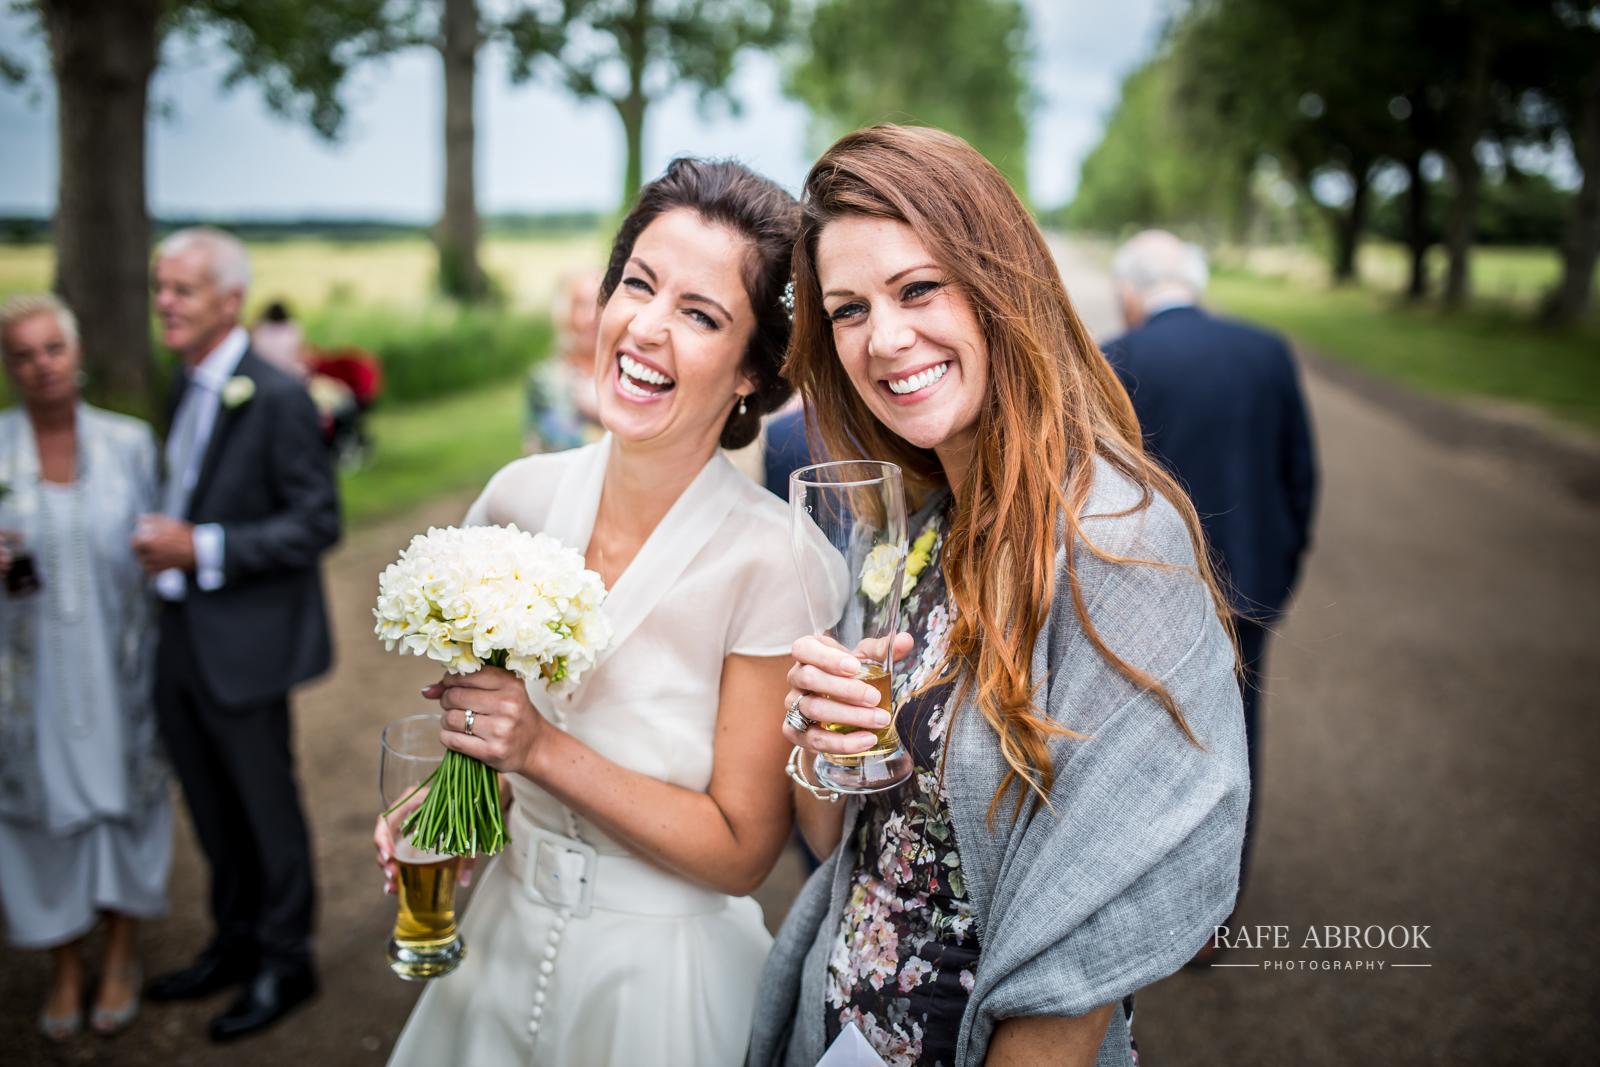 cley windmill wedding norfolk hertfordshire wedding photographer-1248.jpg